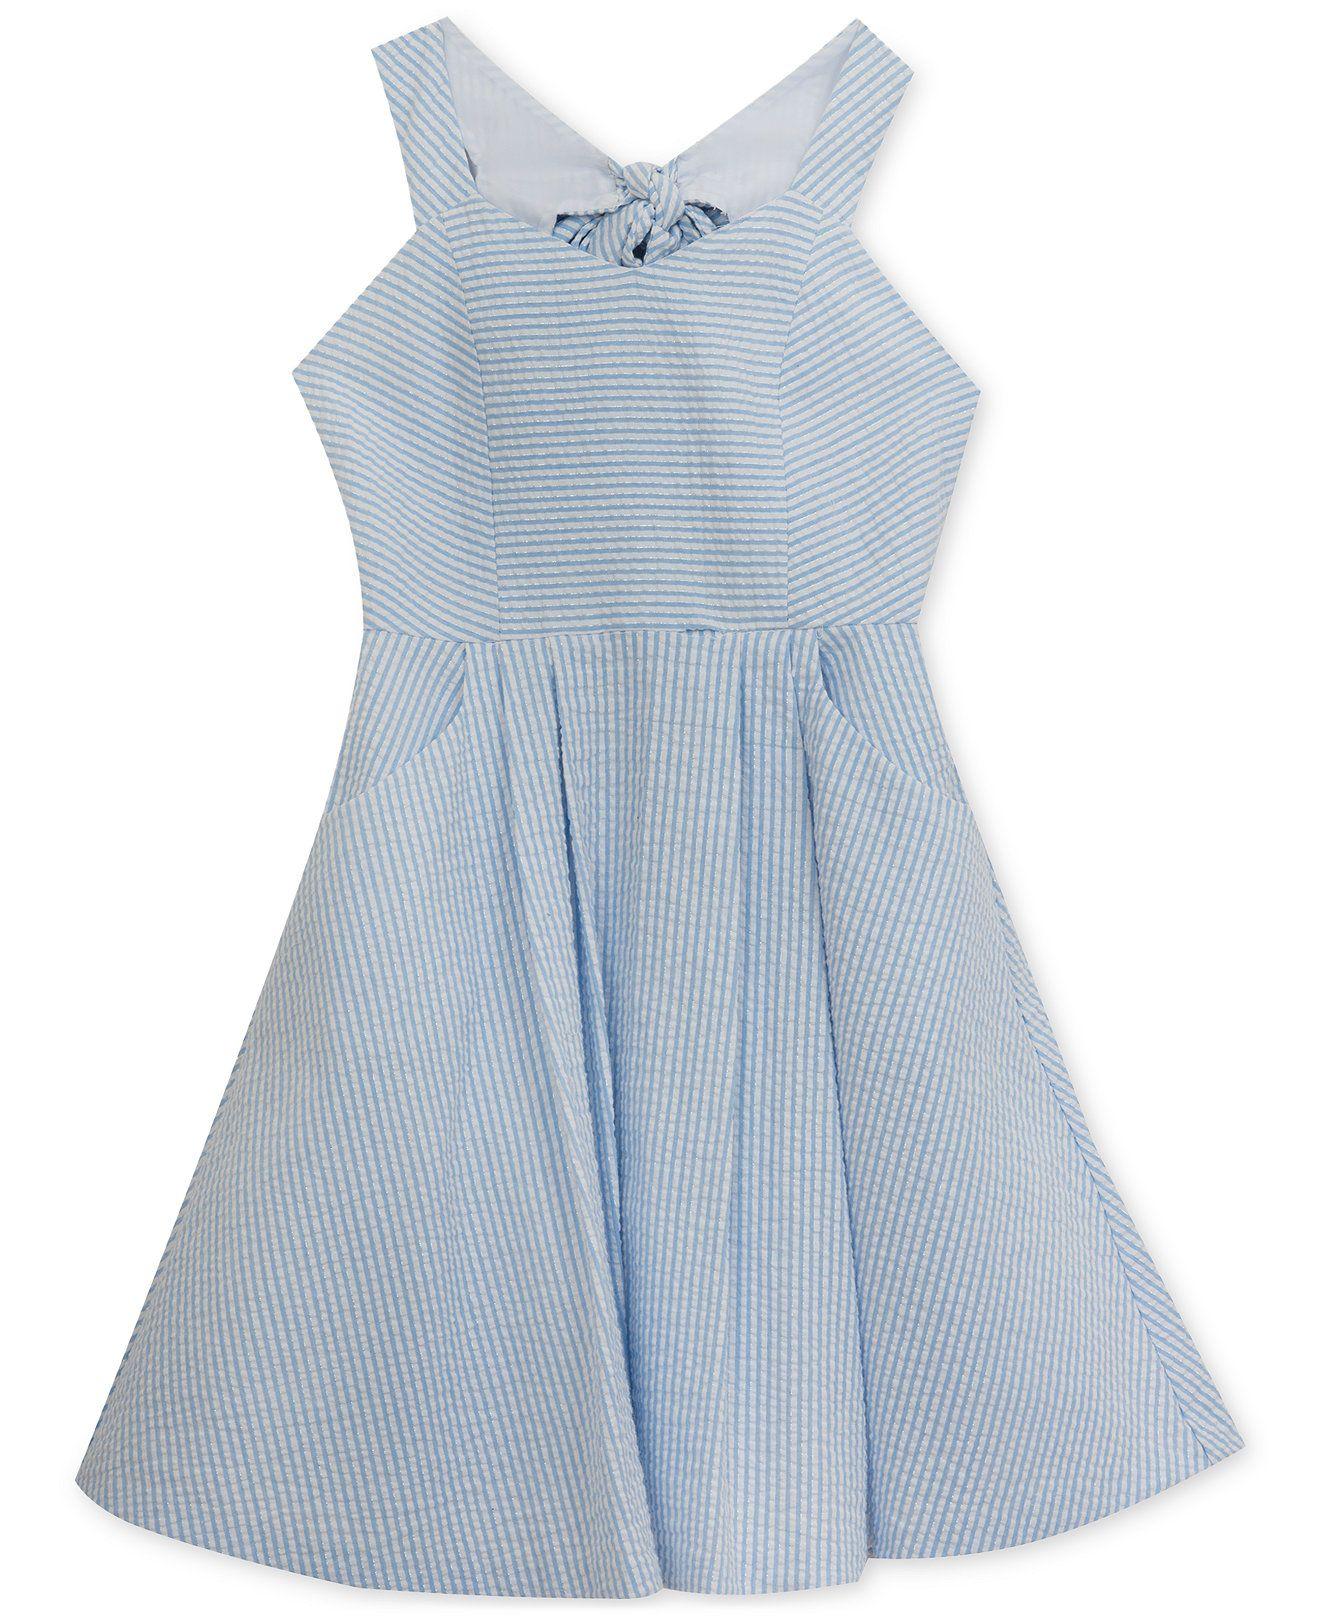 Rare Editions Bow-Back Seersucker Dress, Big Girls (7-16) - Dresses ...